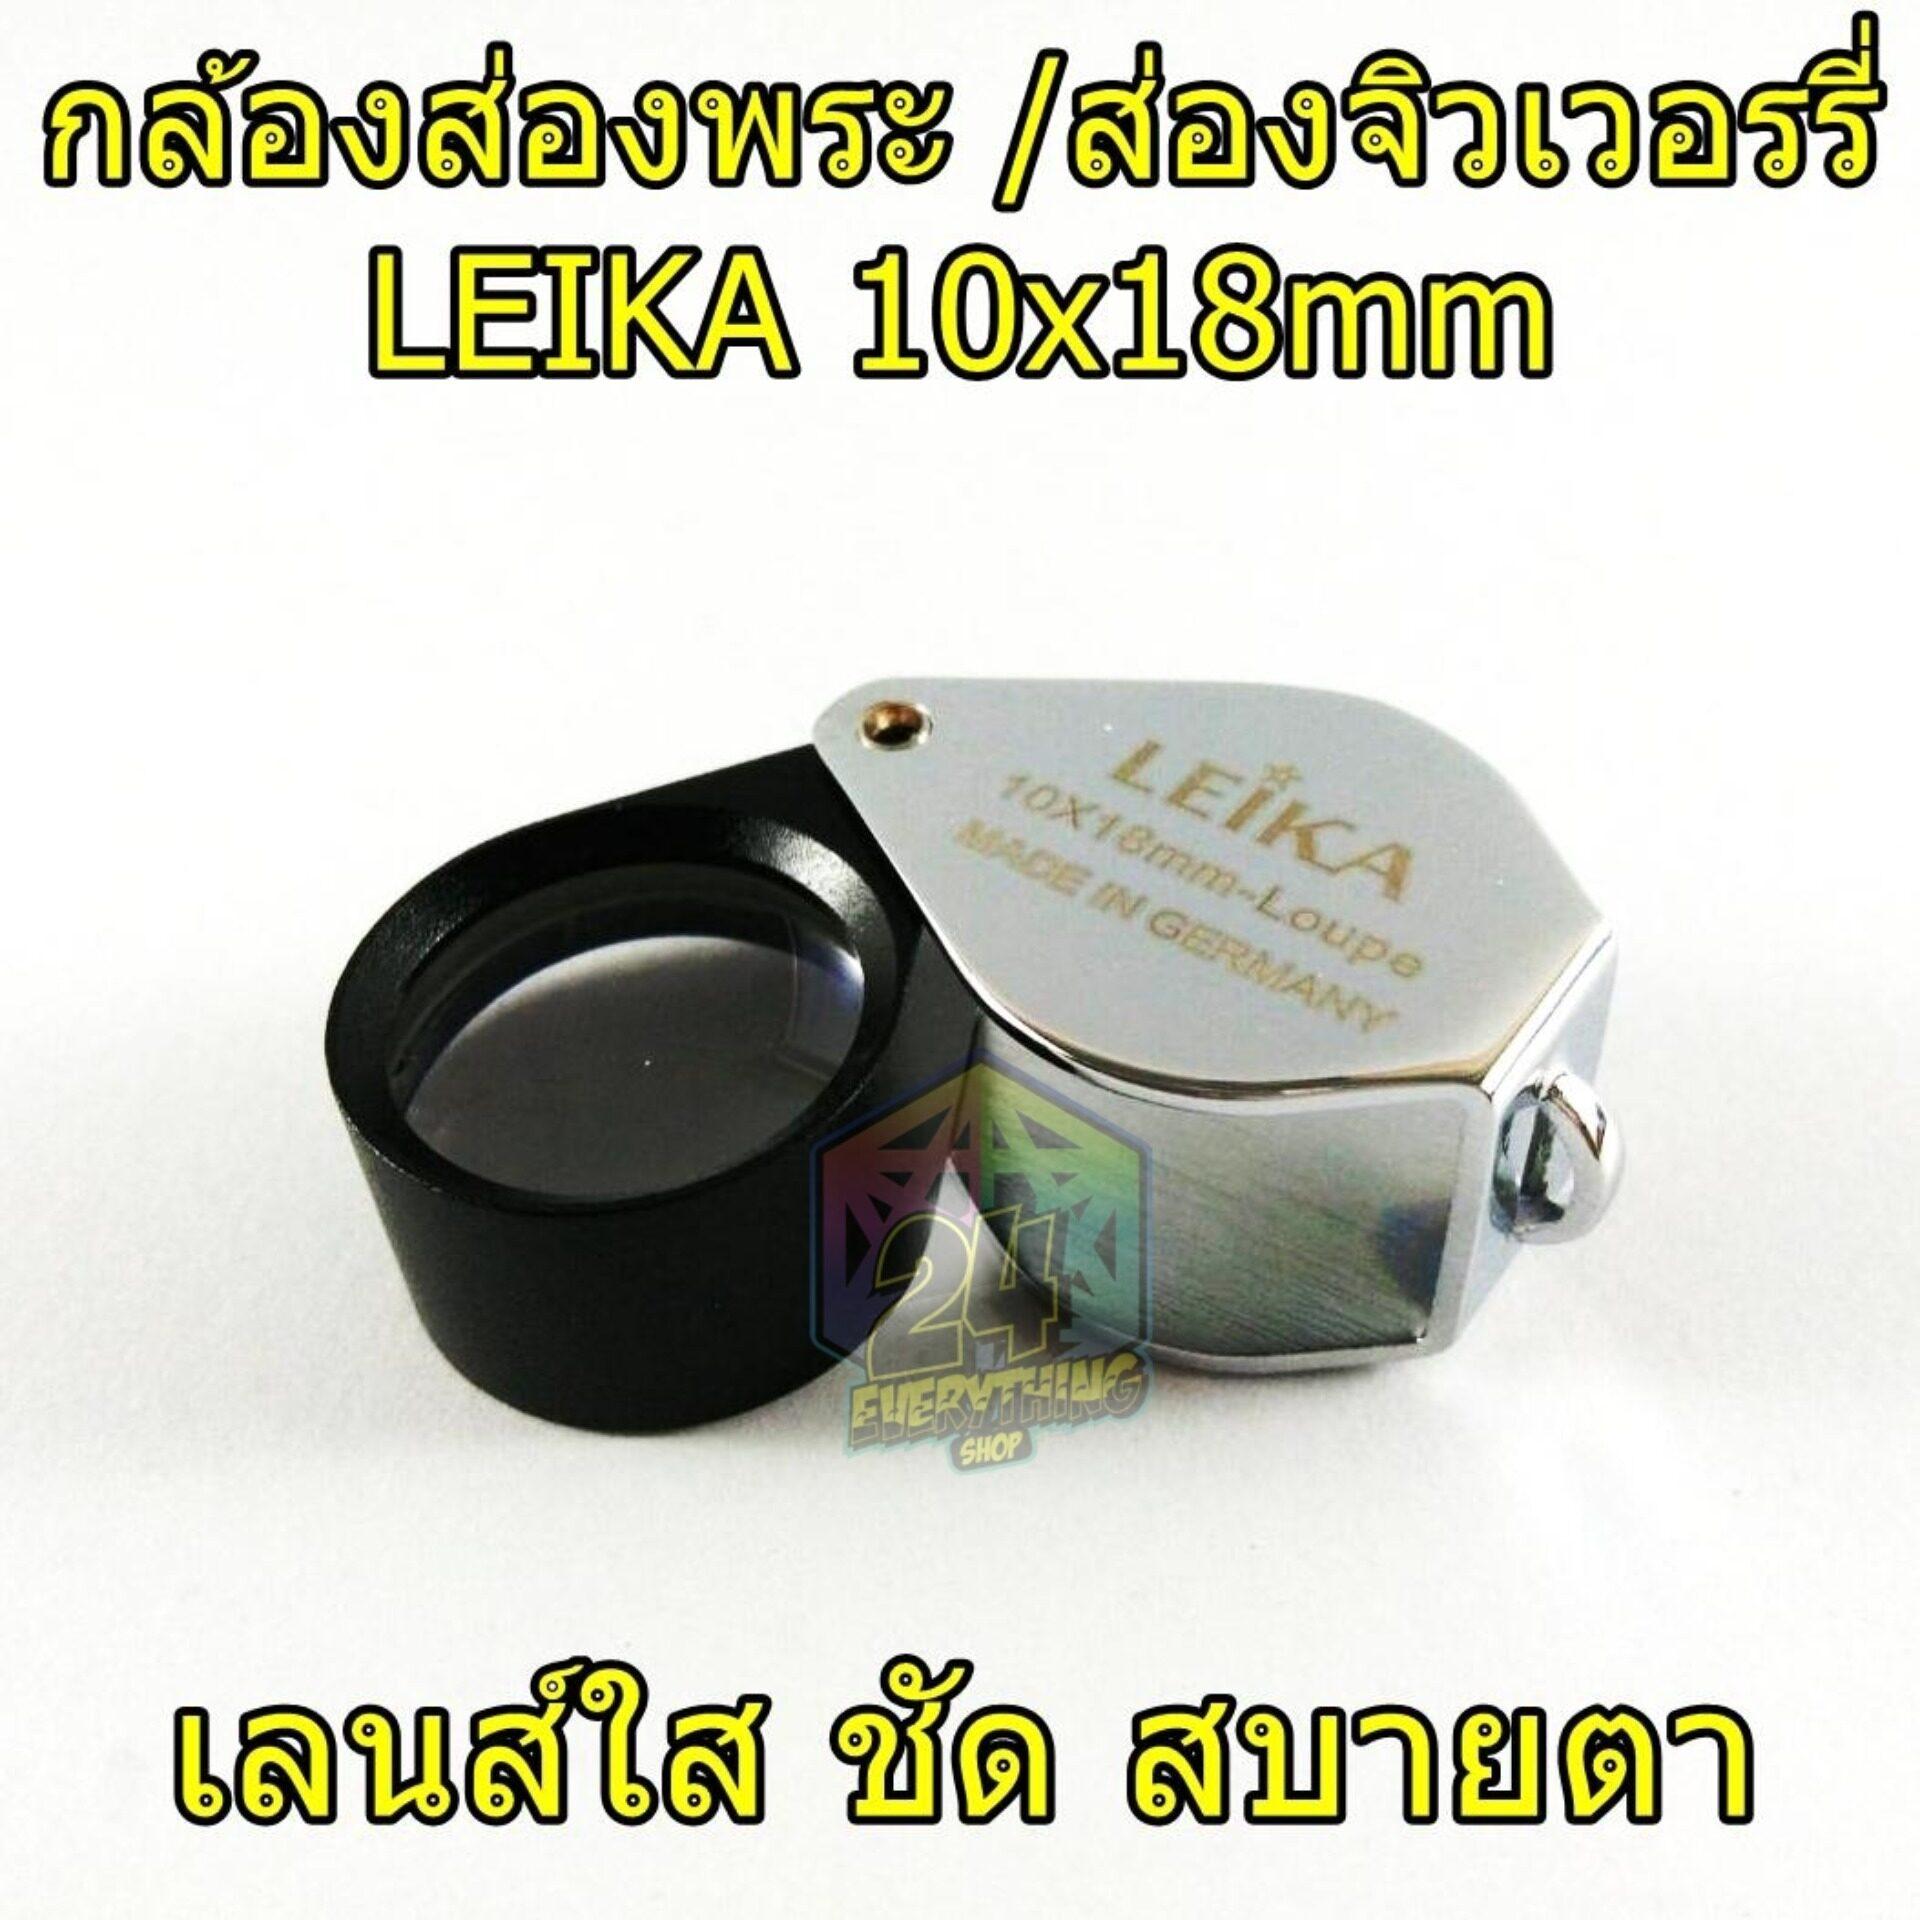 Leika 10x18mm (มีกำลังขยาย 10 เท่า เส้นผ่าศูนย์กลาง 18 มิลลิเมตร) กล้องส่องพระ /ส่องจิวเวอรรี่ เลนส์แก้วเคลือบมัลติโค๊ตตัดแสง บอดี๊สีโครเมี่ยม.